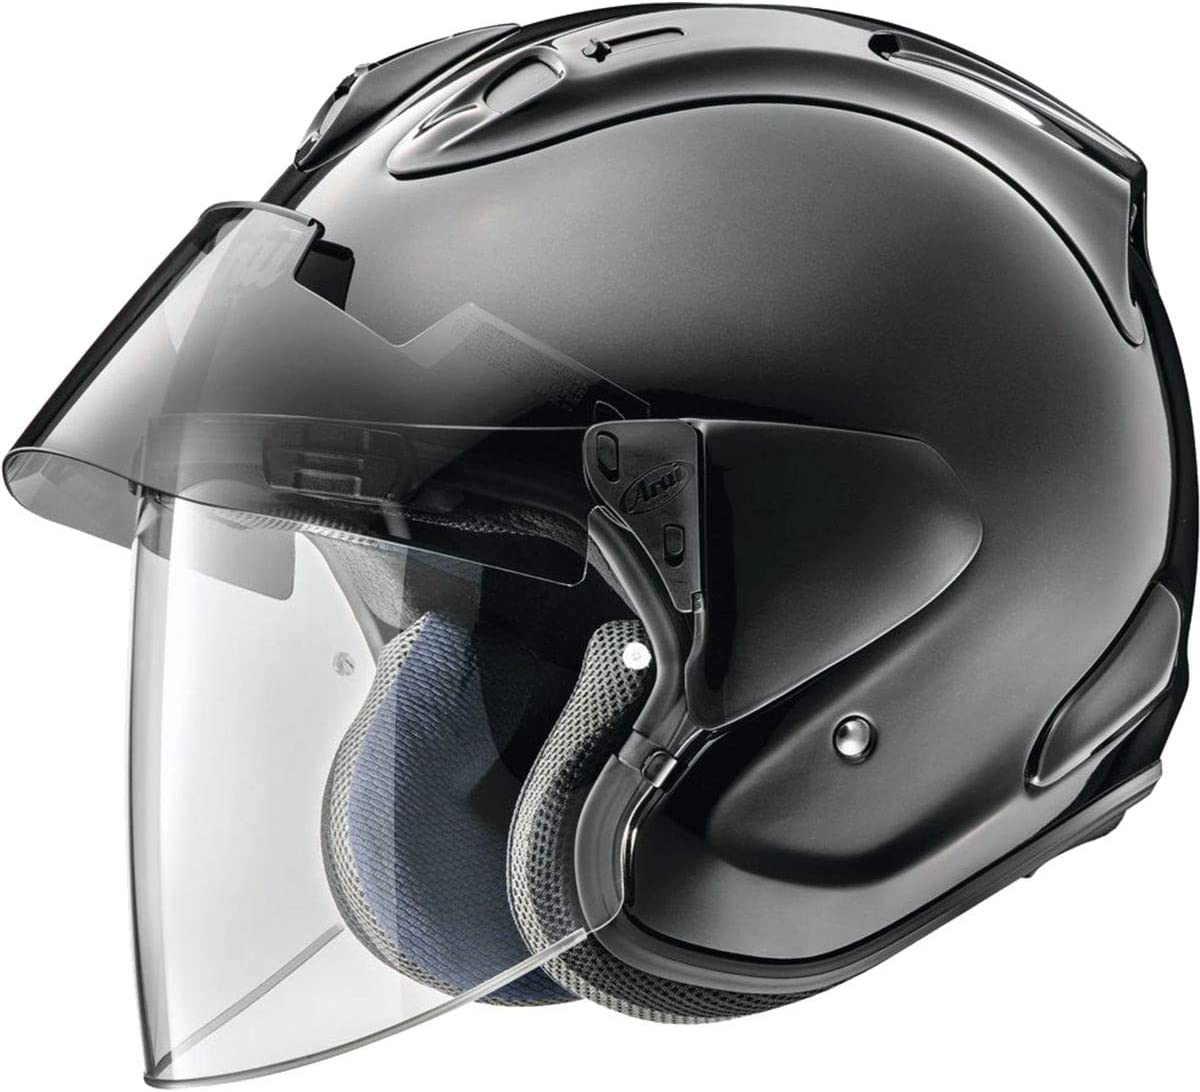 Arai Ram-X Solid Adult Popular shop is the lowest price challenge New York Mall Street - Motorcycle Black Helmet Diamond